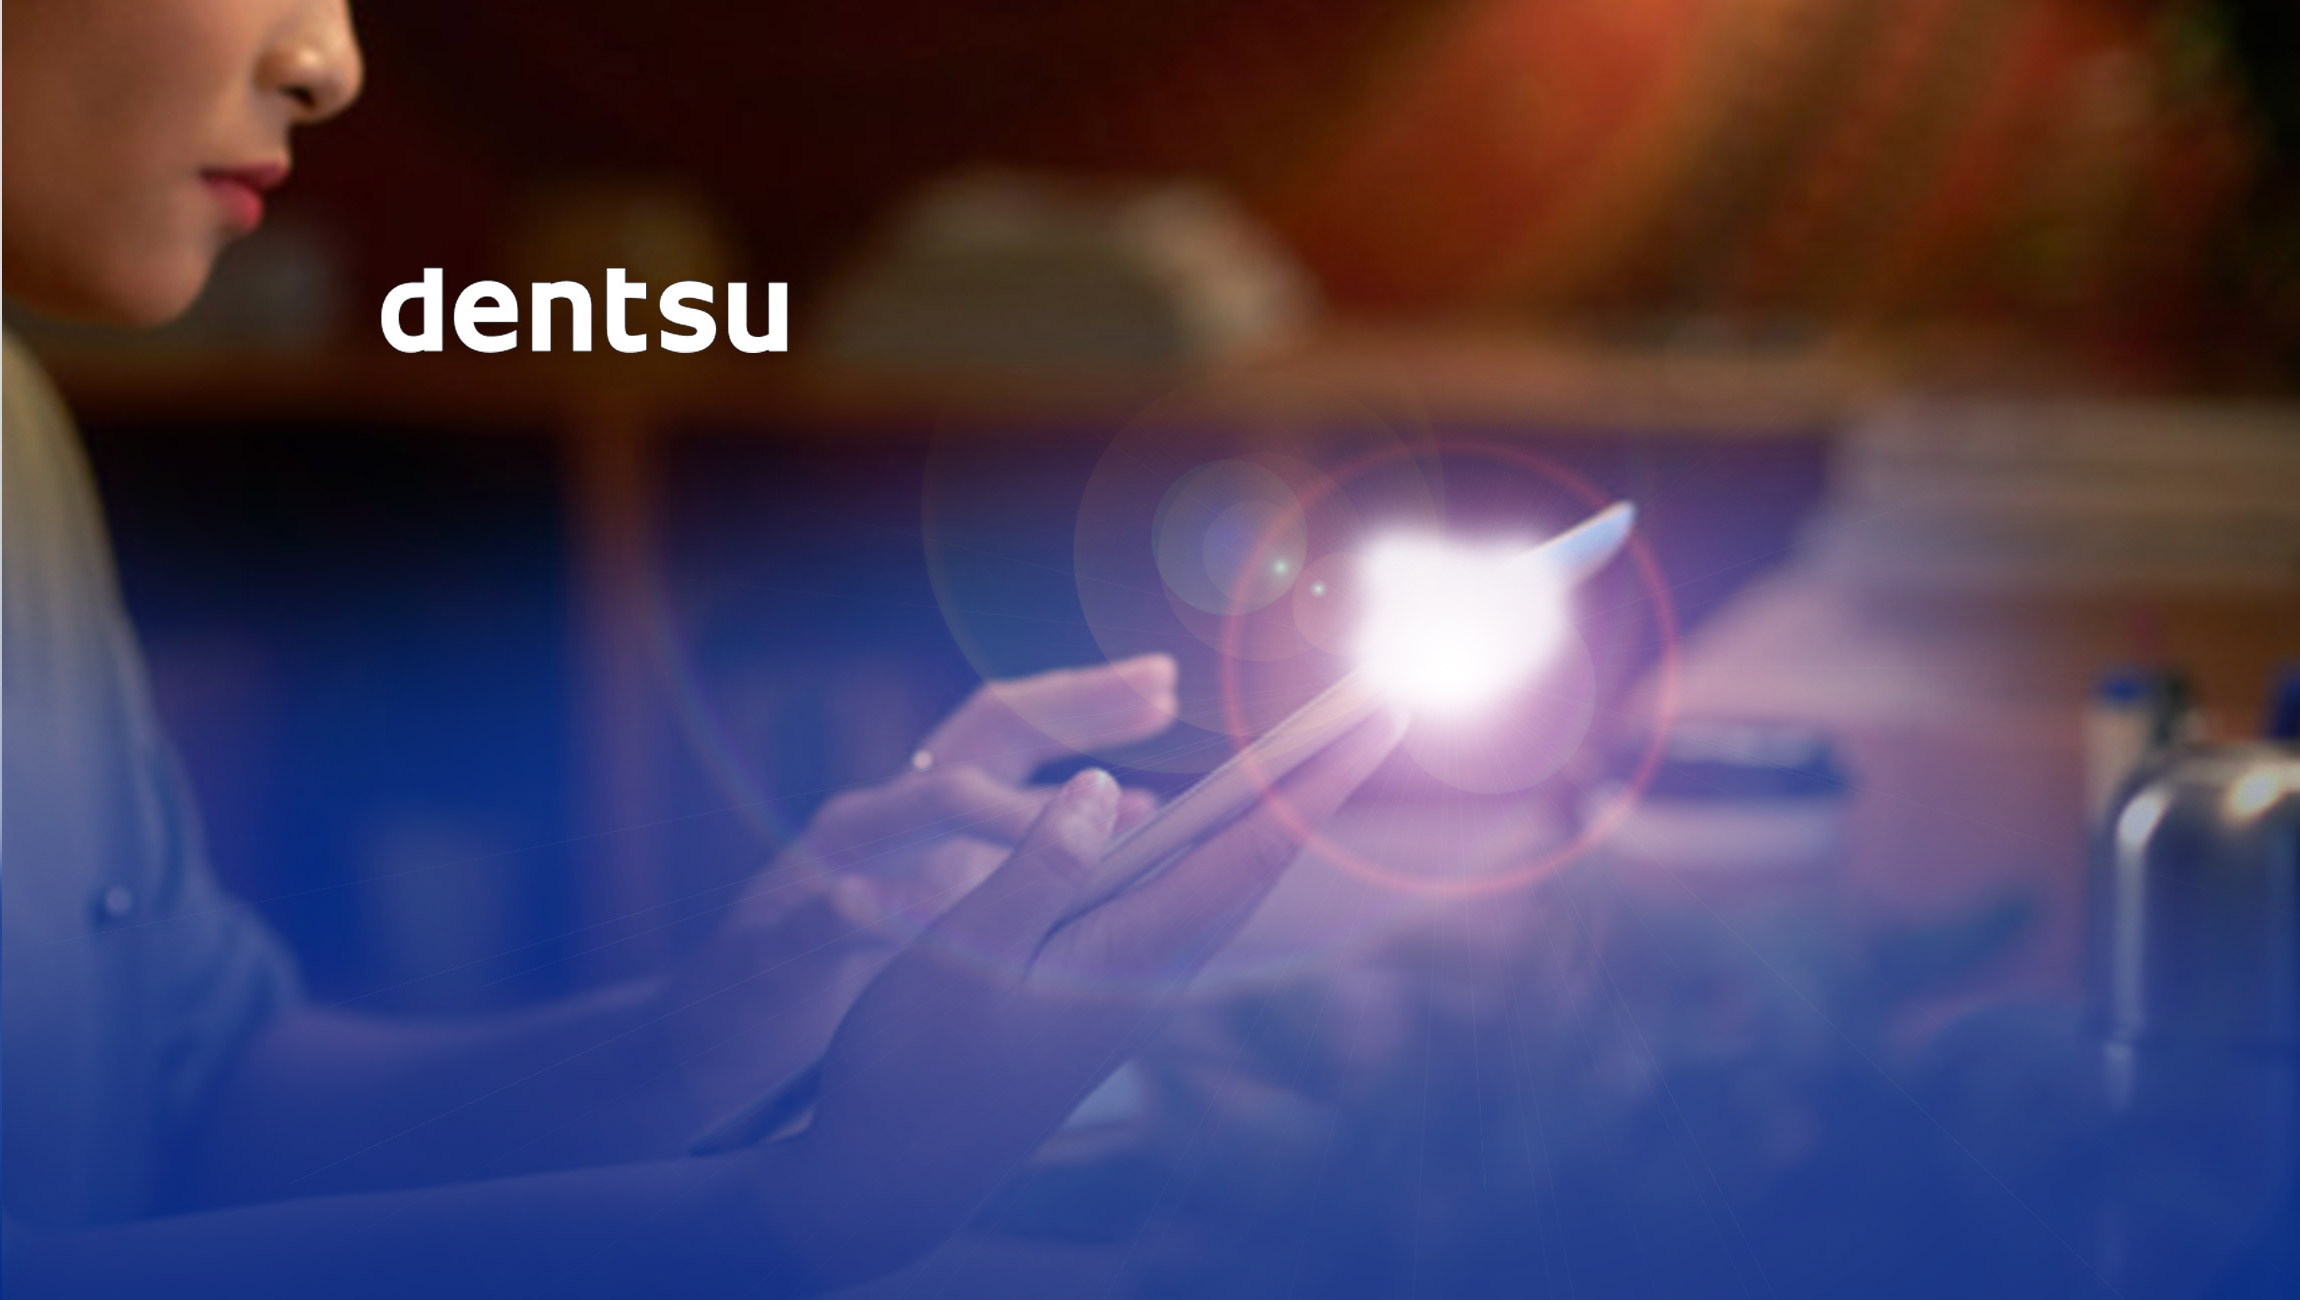 Dentsu Partners with Adobe to Transform Customer Experiences Through Digital Innovation